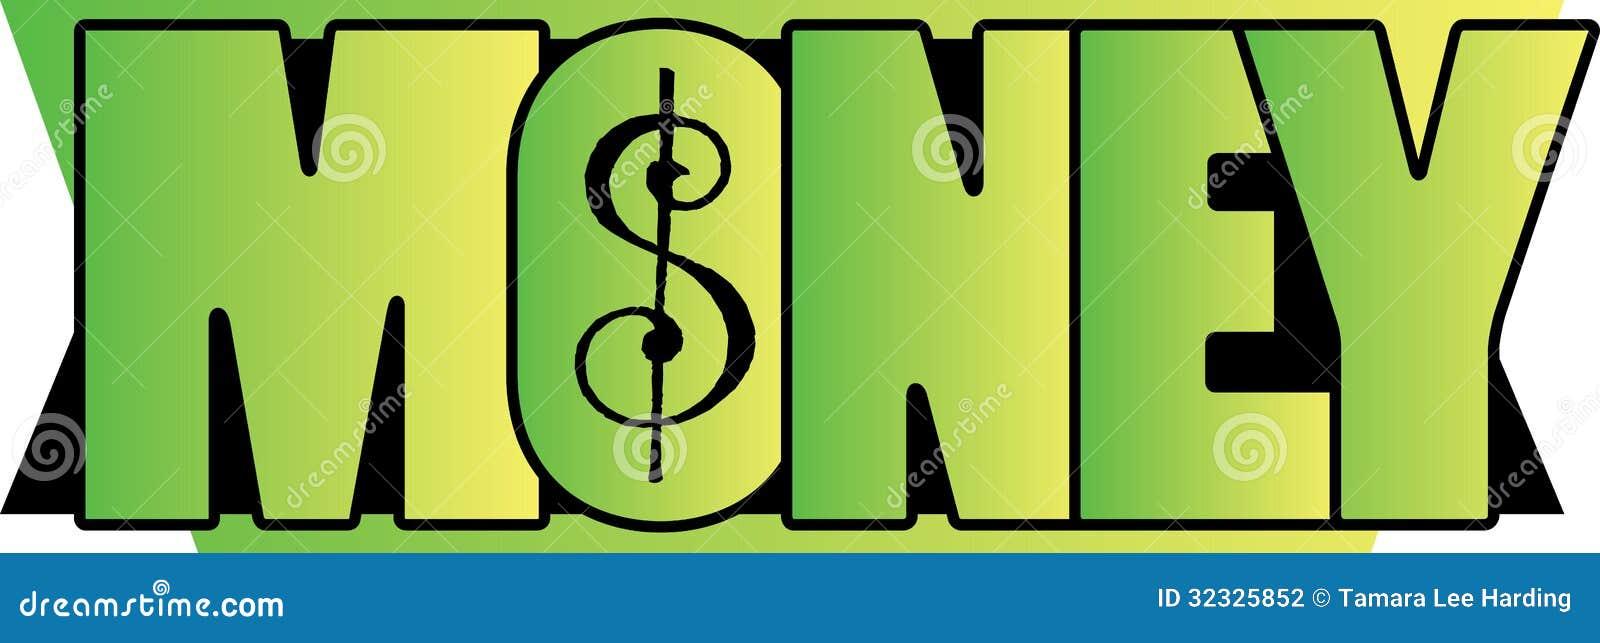 Money Graphic Stock Vector Illustration Of Savings Advertisement